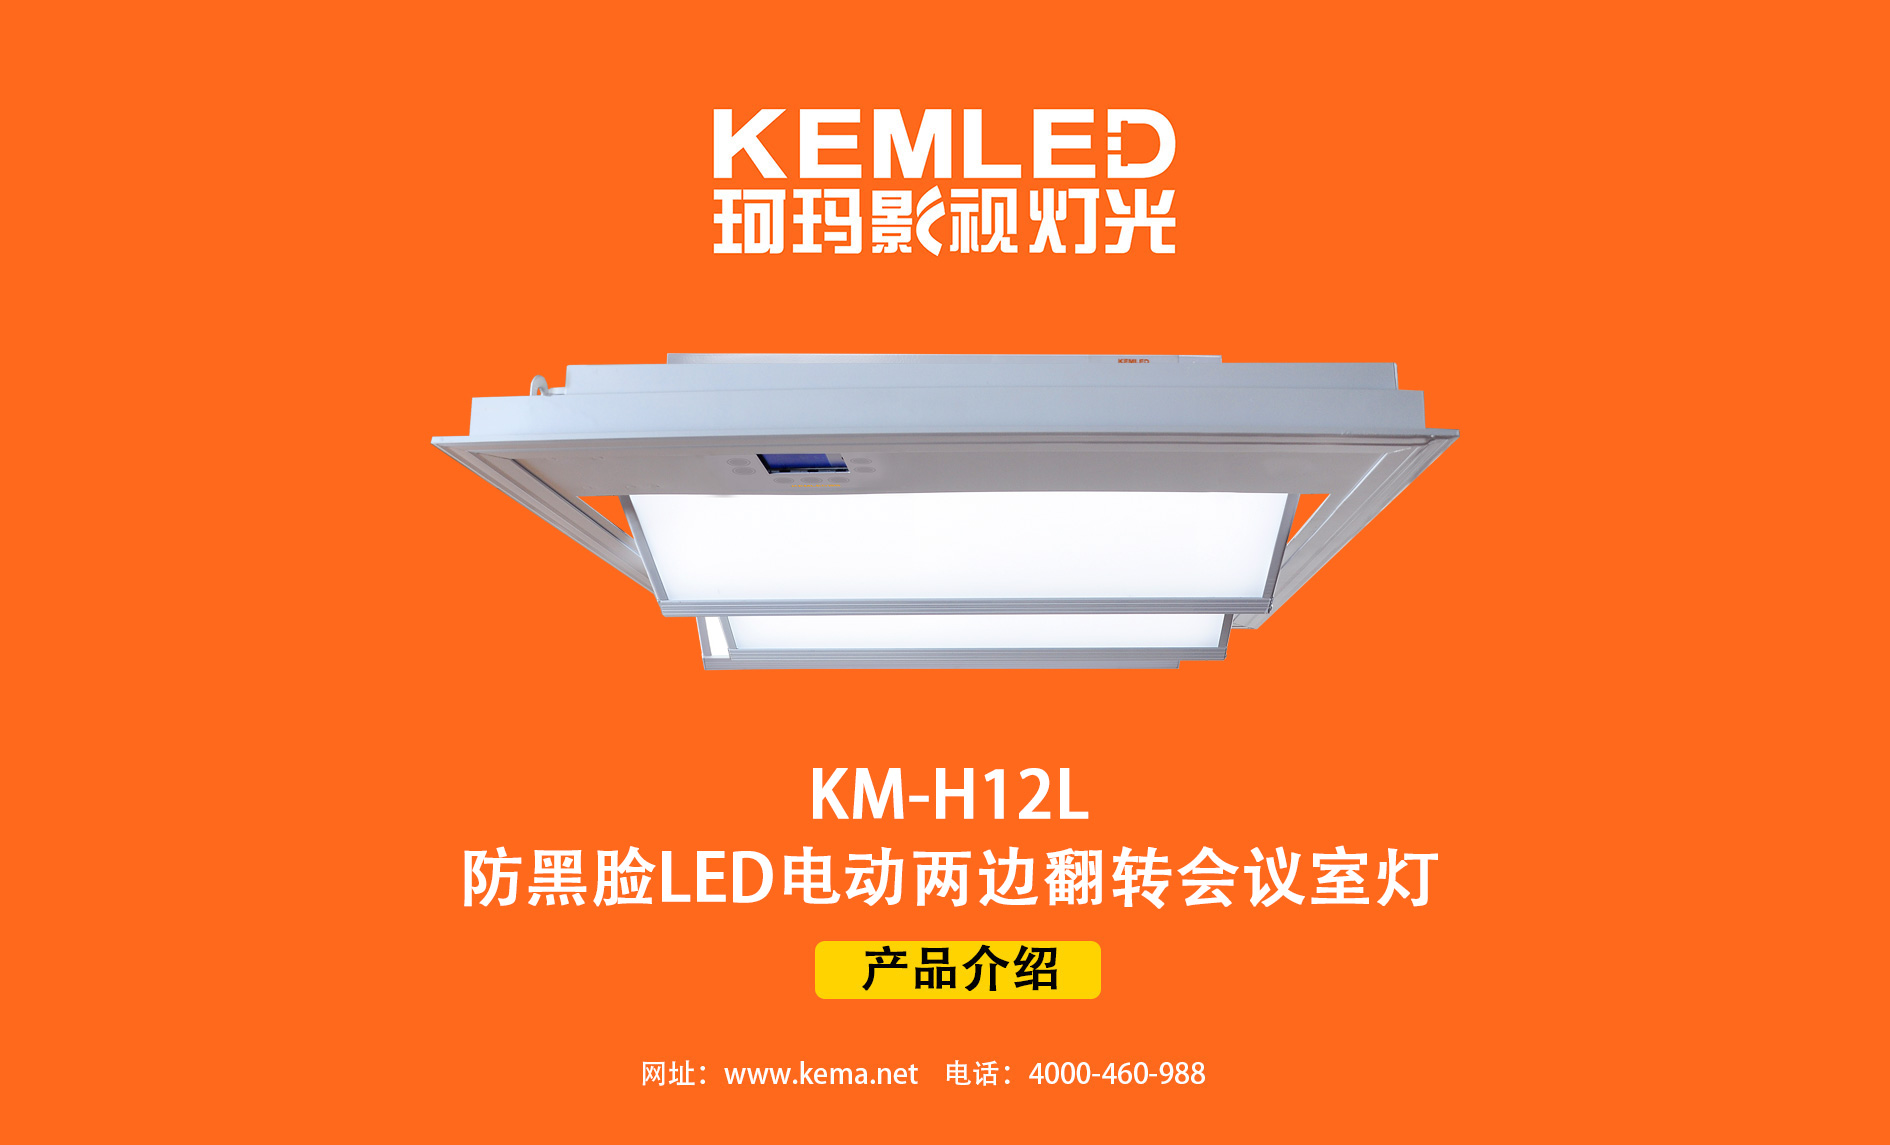 KM-H12L 防黑脸LED电动两边翻转会议室平板灯